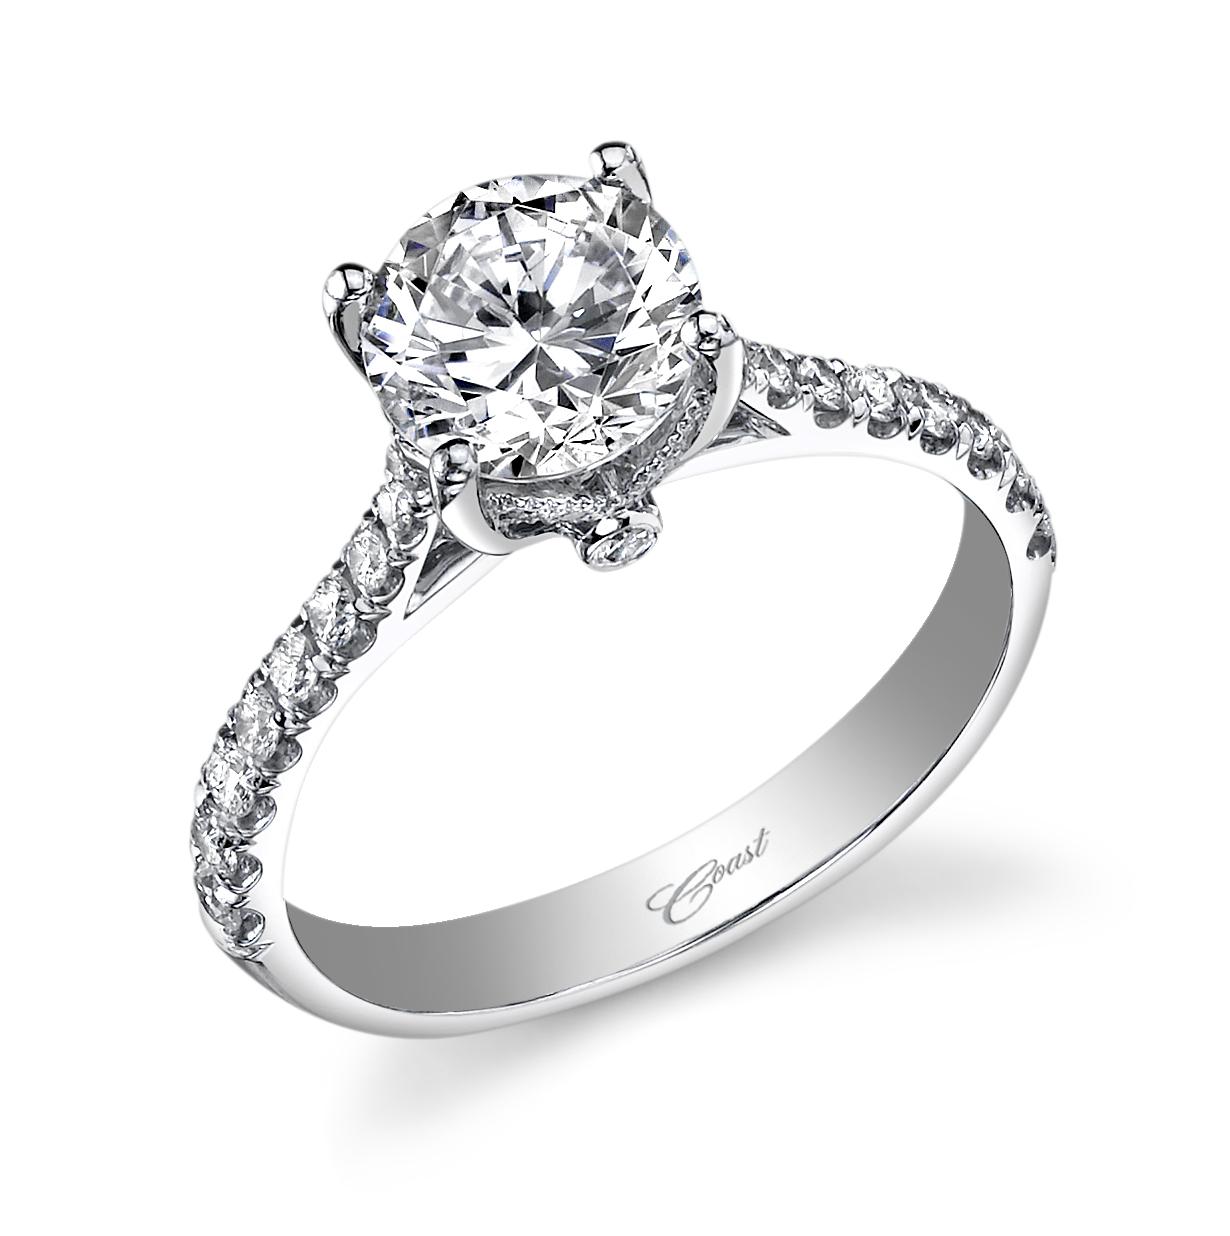 Coast Diamond Ring Designer engagement rings, Engagement